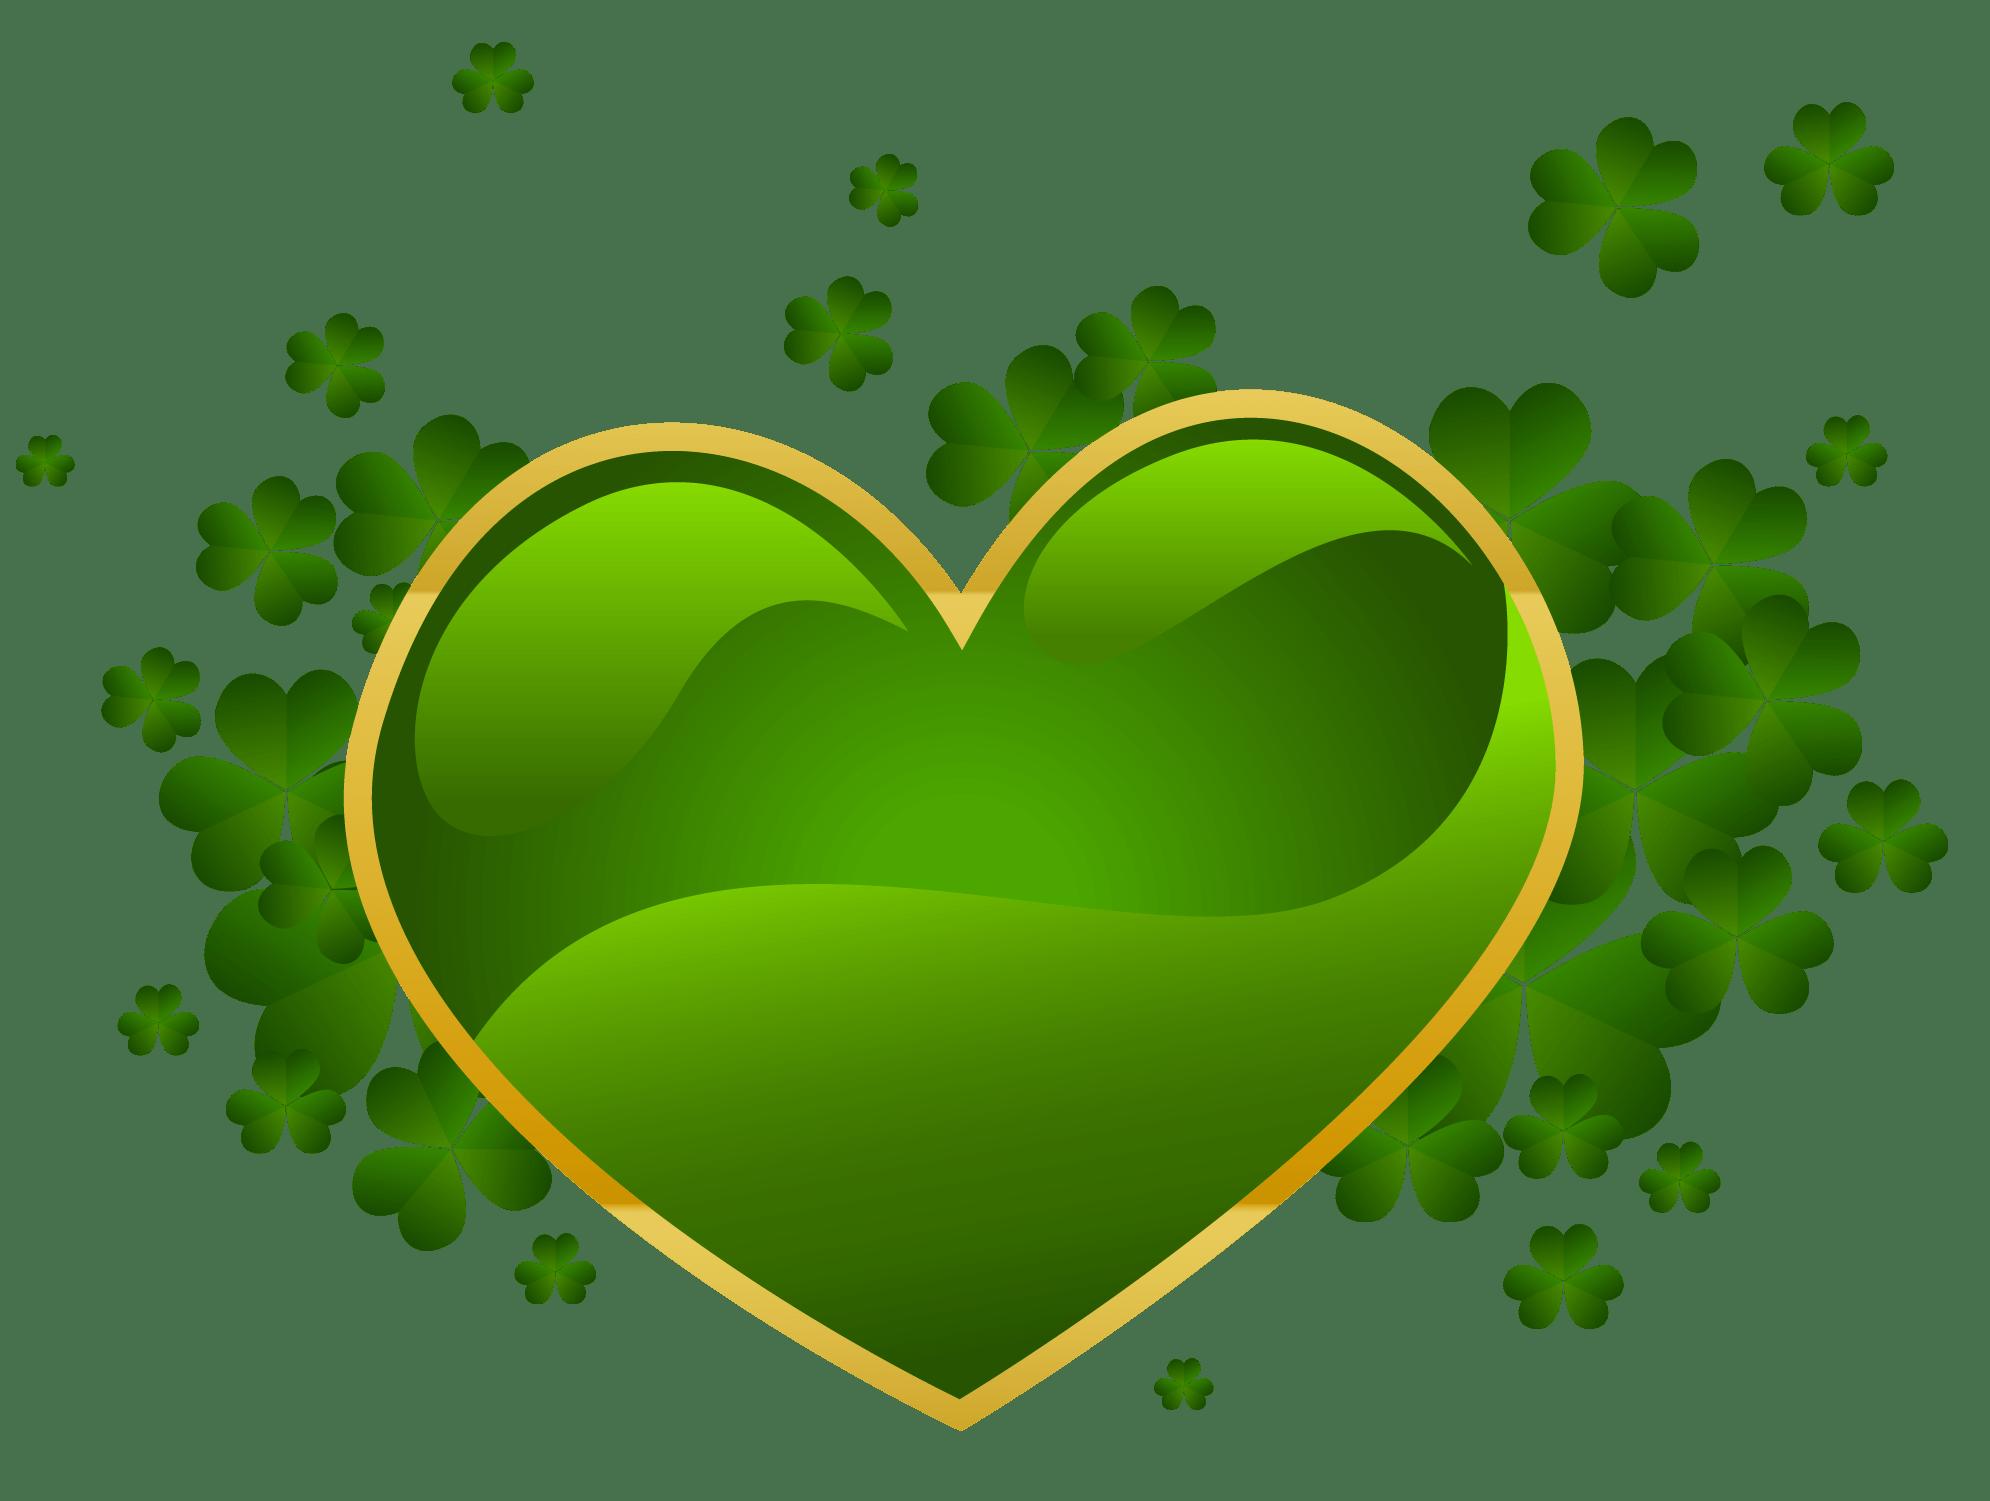 1990x1501 St Patrick's Day Transparent Png Images